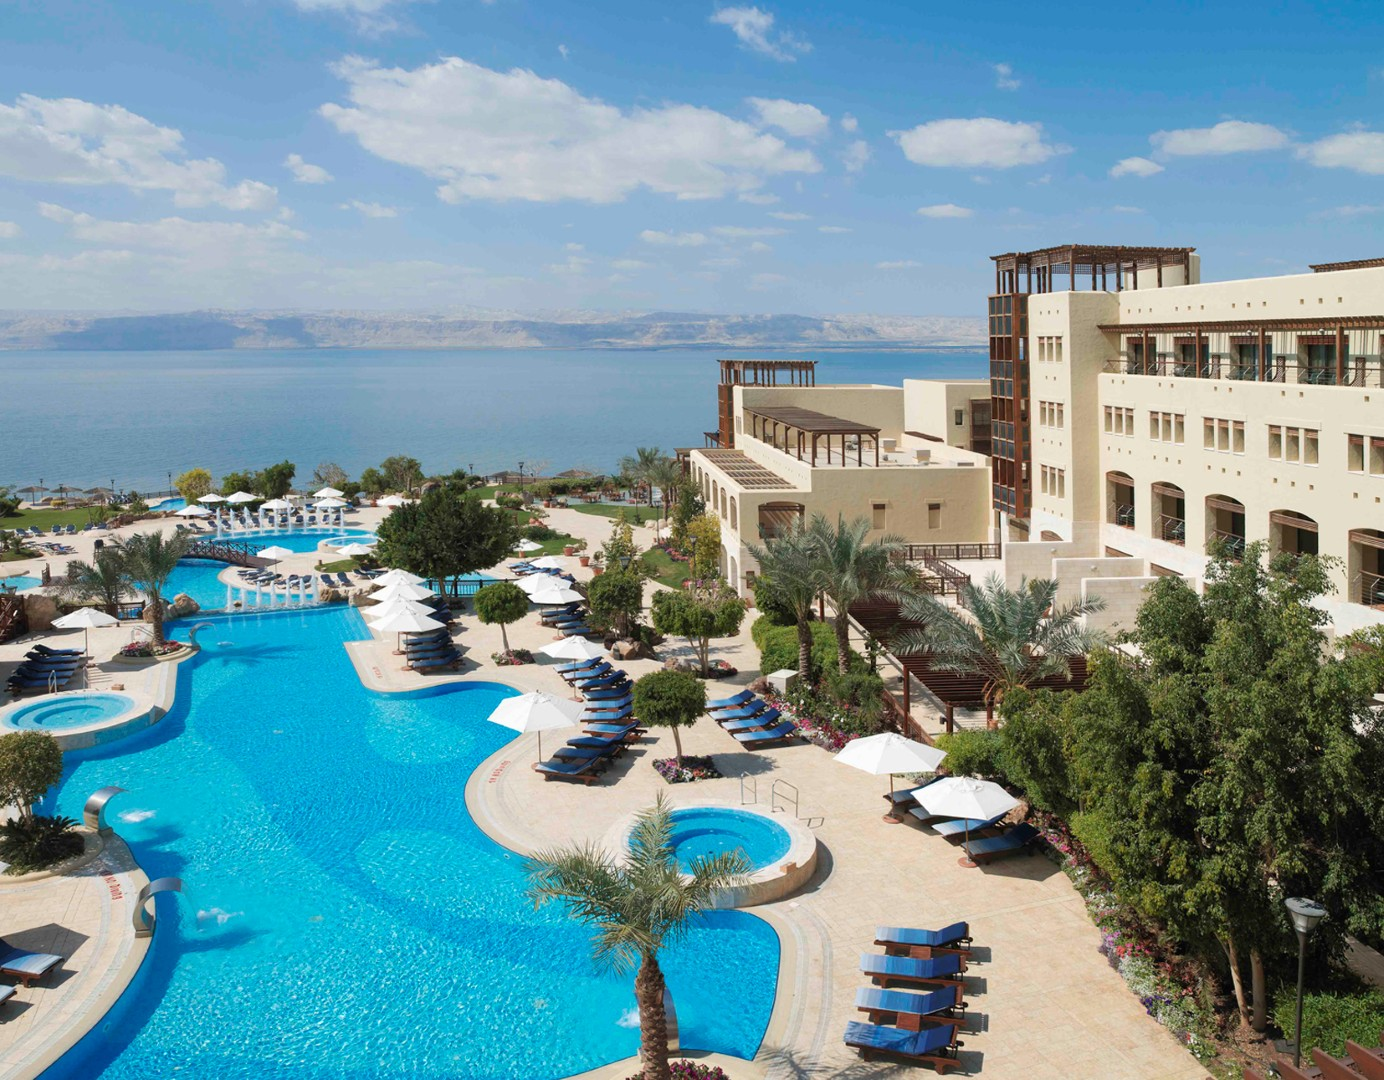 Hotel Intercontinental 5* - Aqaba